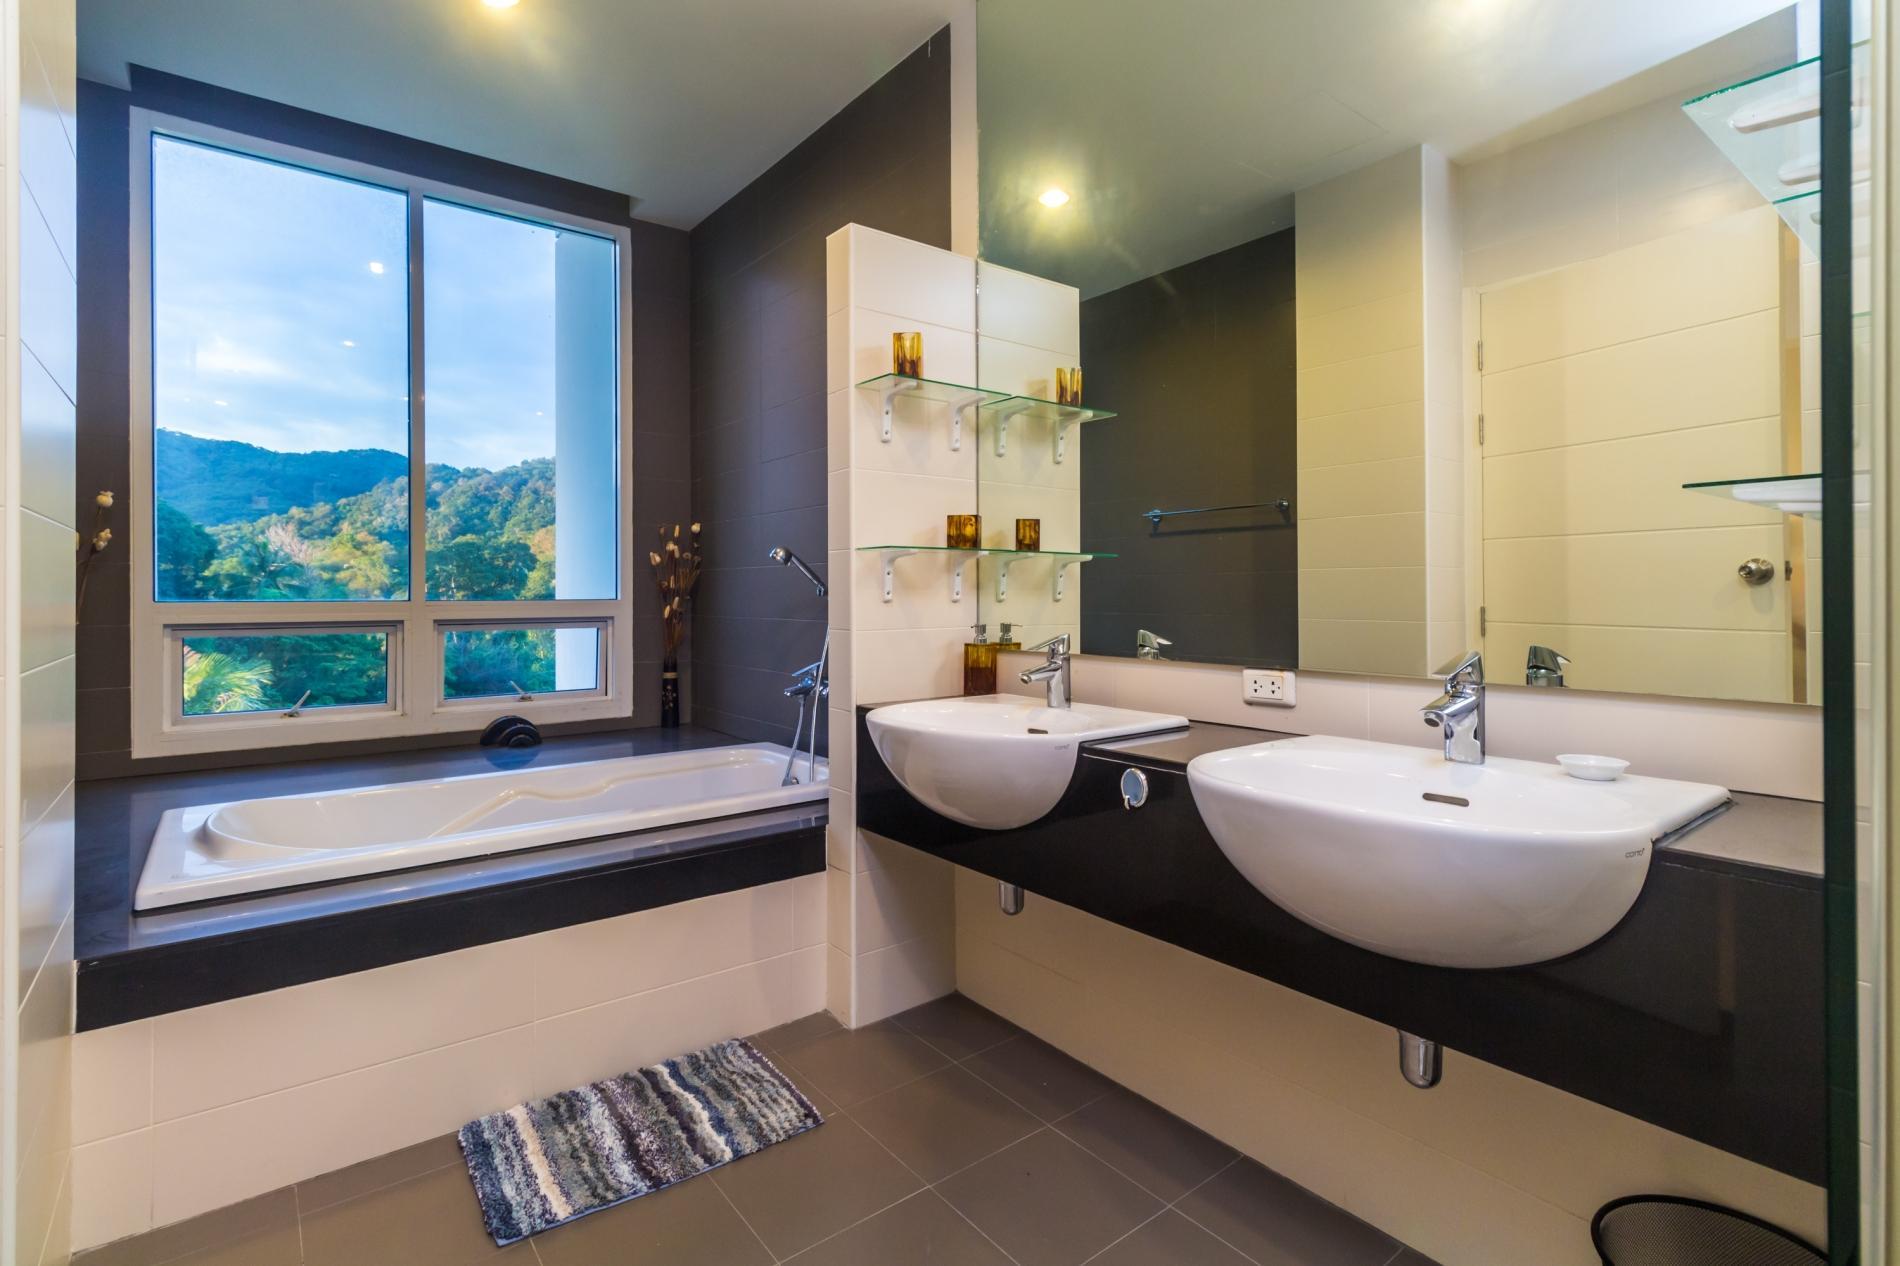 Apartment KH2605 - Sea-view Penthouse in Karon  walk to beach  restaurants  bars  shops photo 20320995